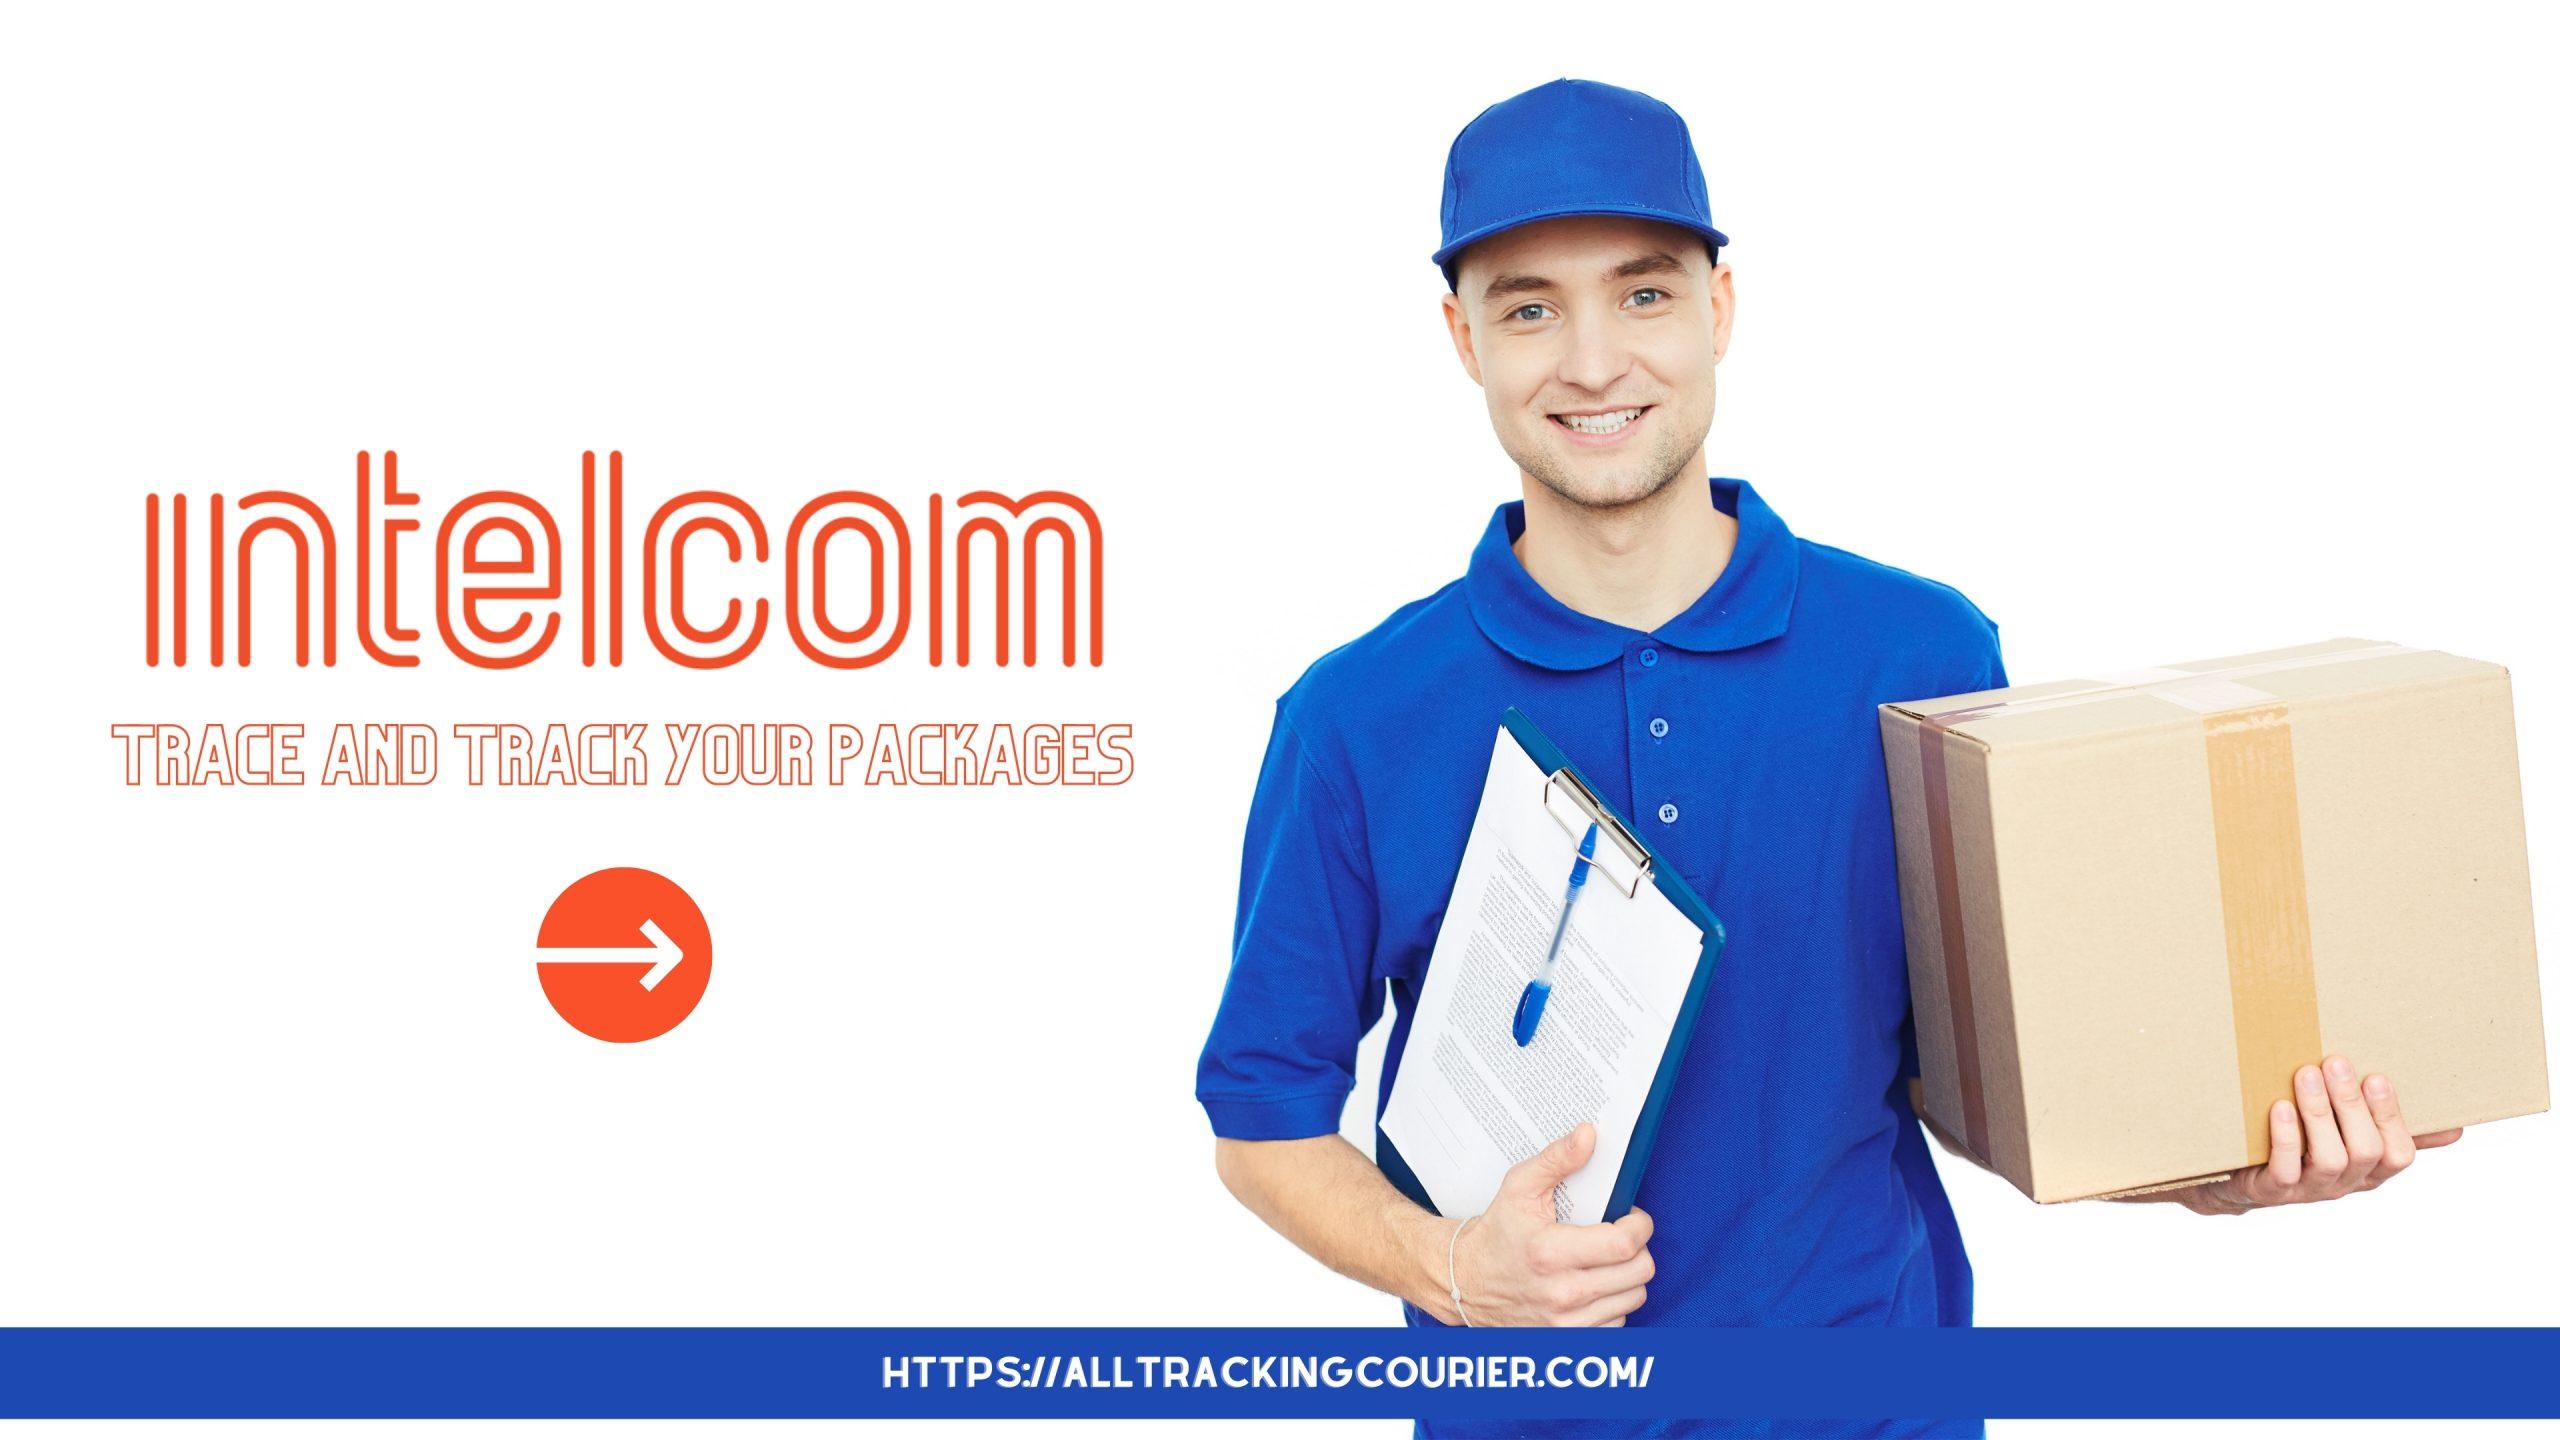 Intelcom Tracking